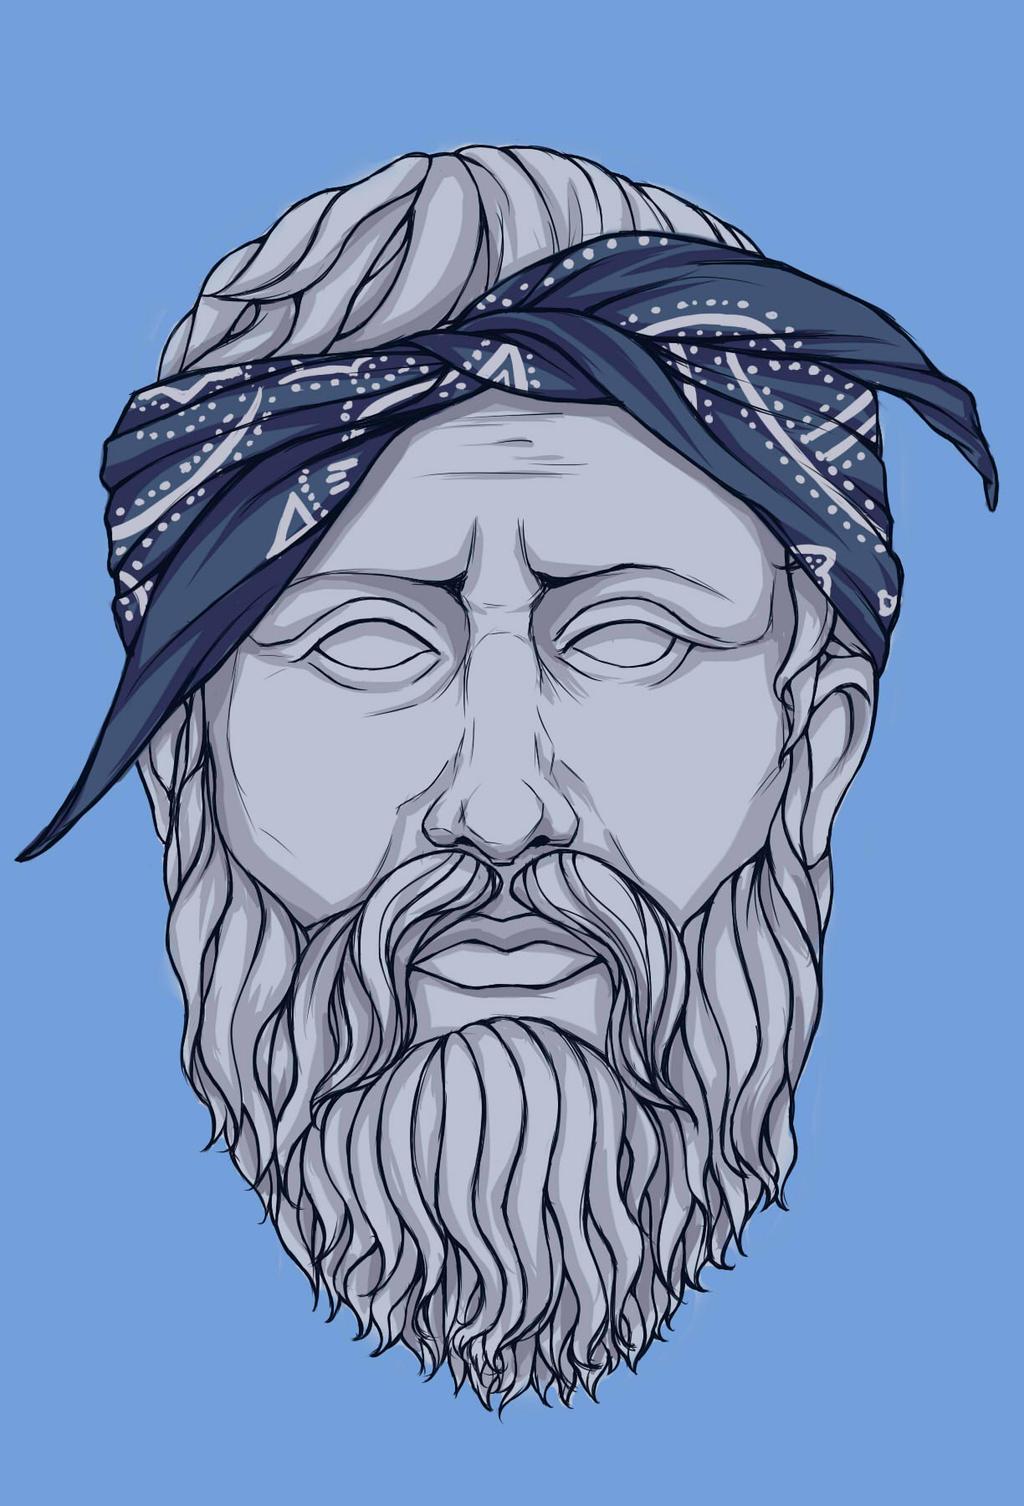 Philosophical Gangsta By A Star G On Deviantart